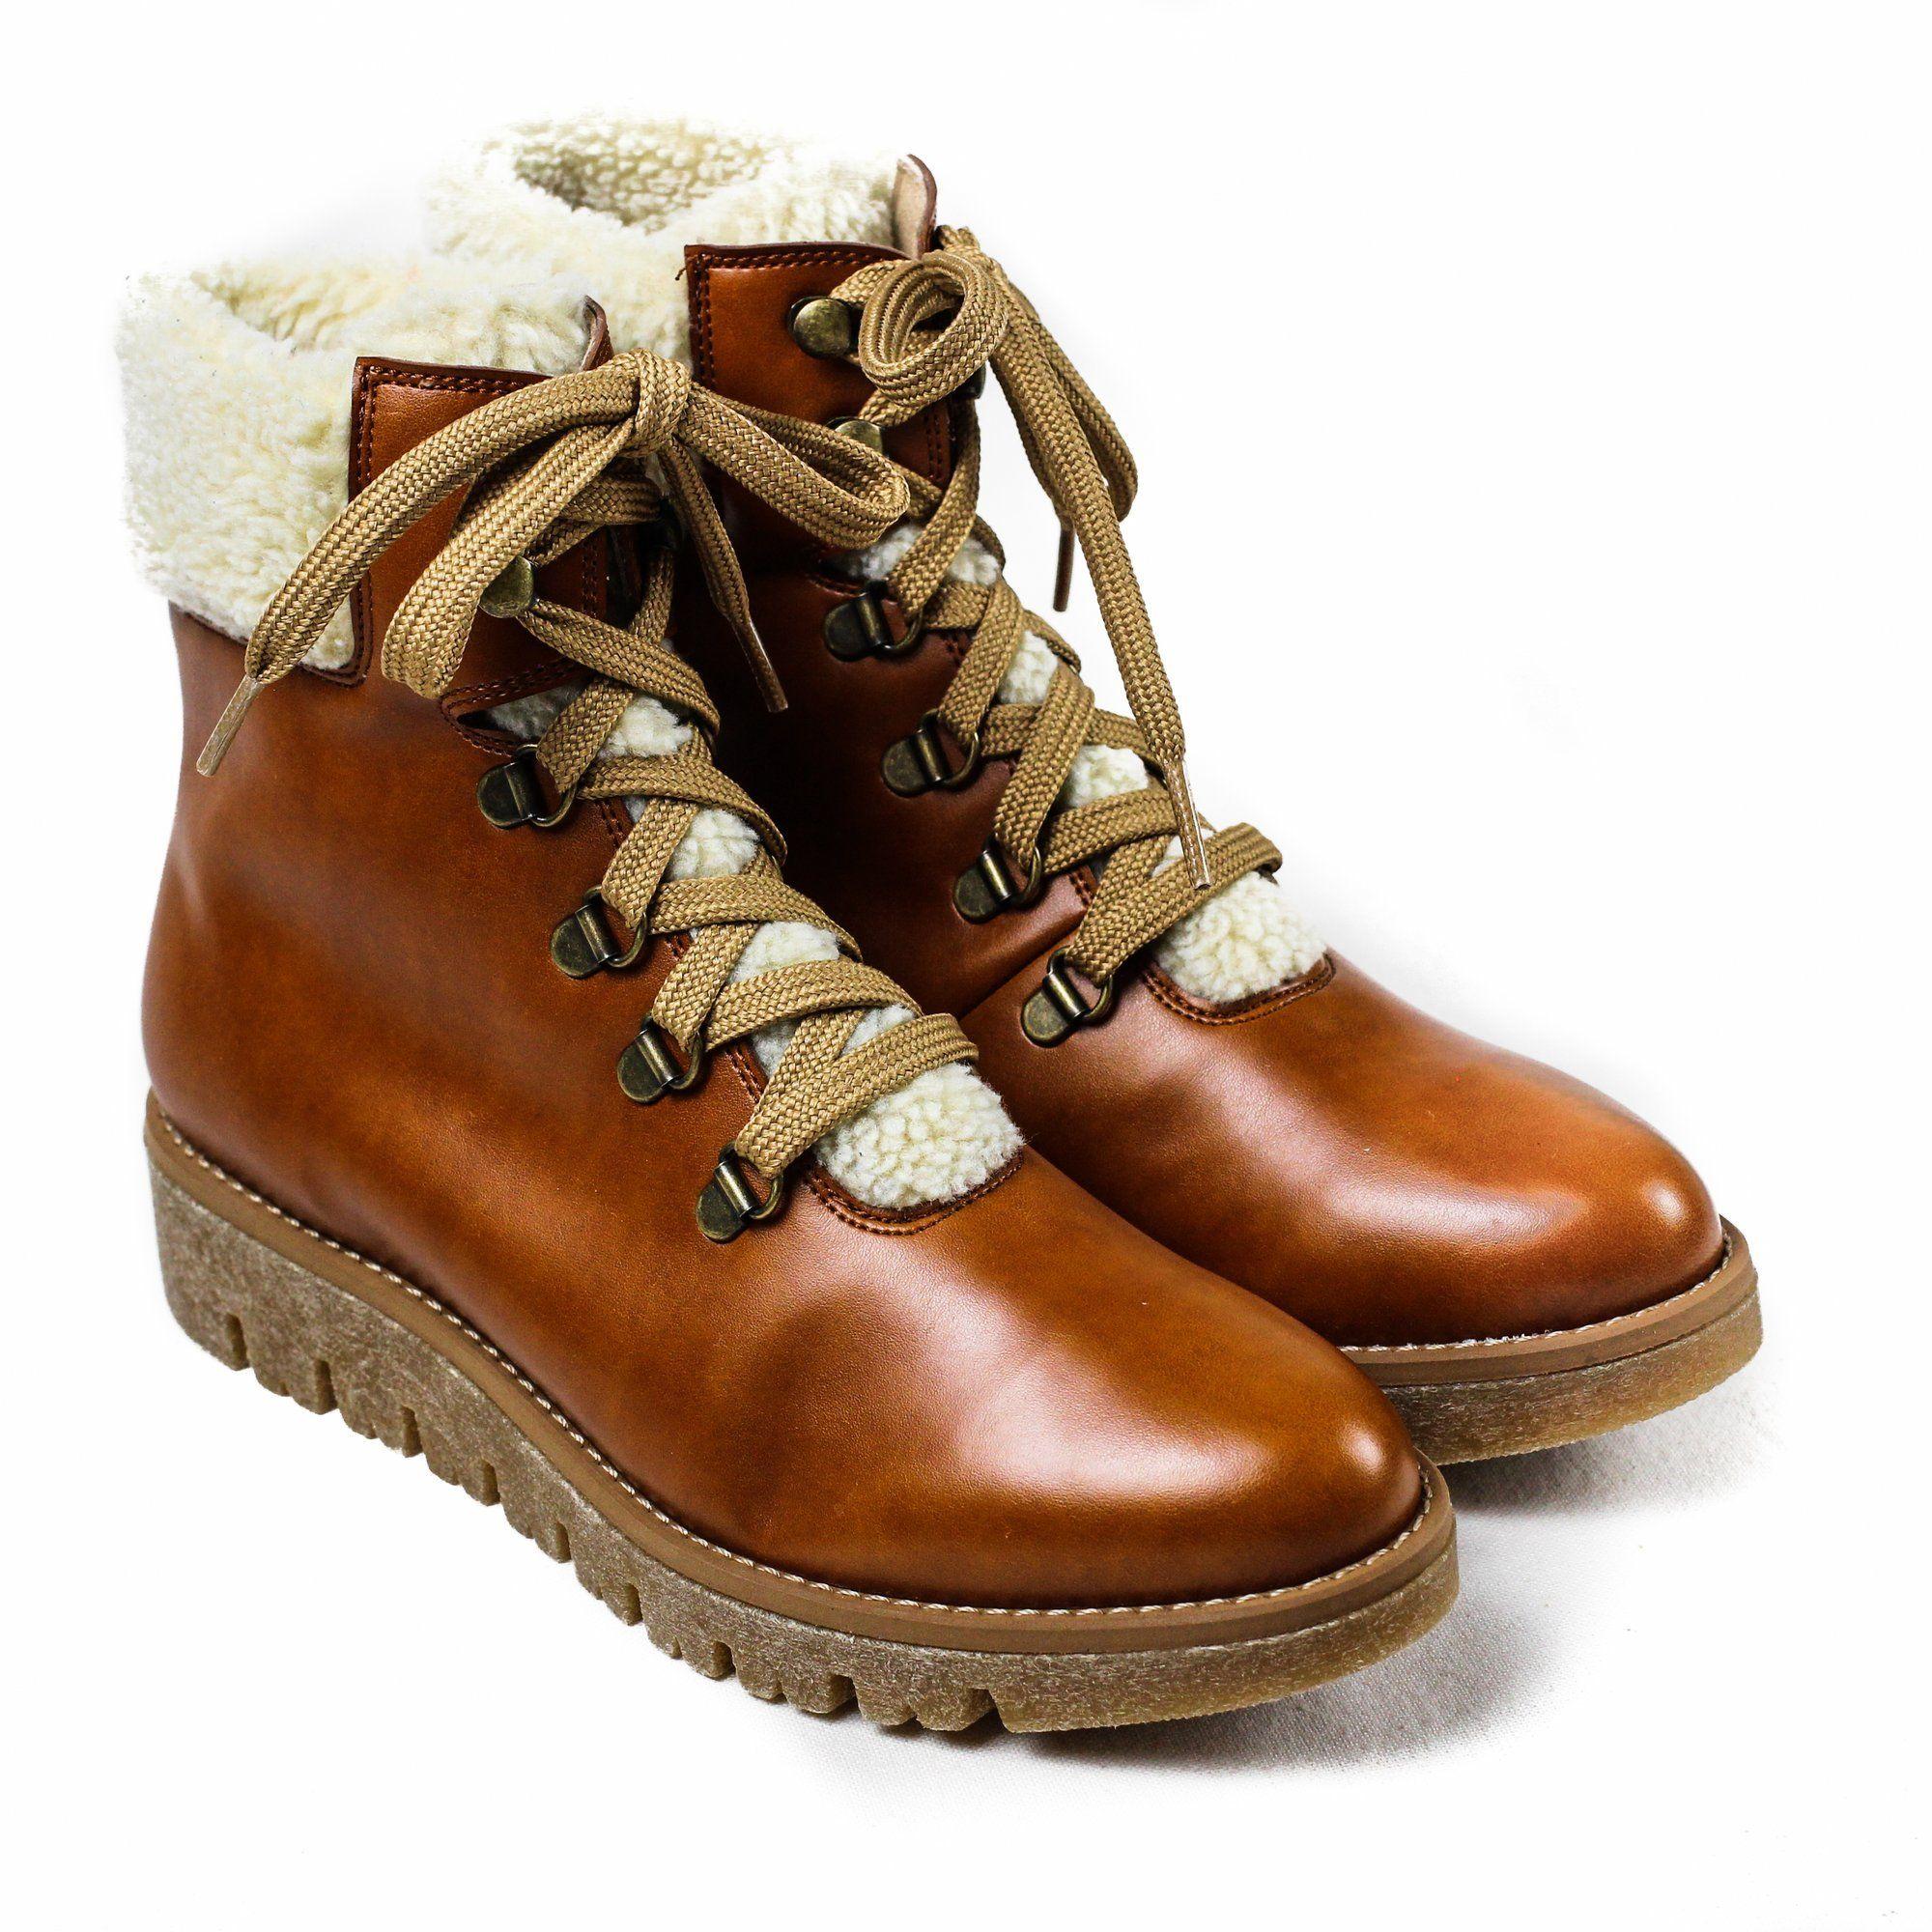 fcca2d046 Aspen Hiker Boot in Natural from Bhava | Gift Ideas | Vegan winter ...